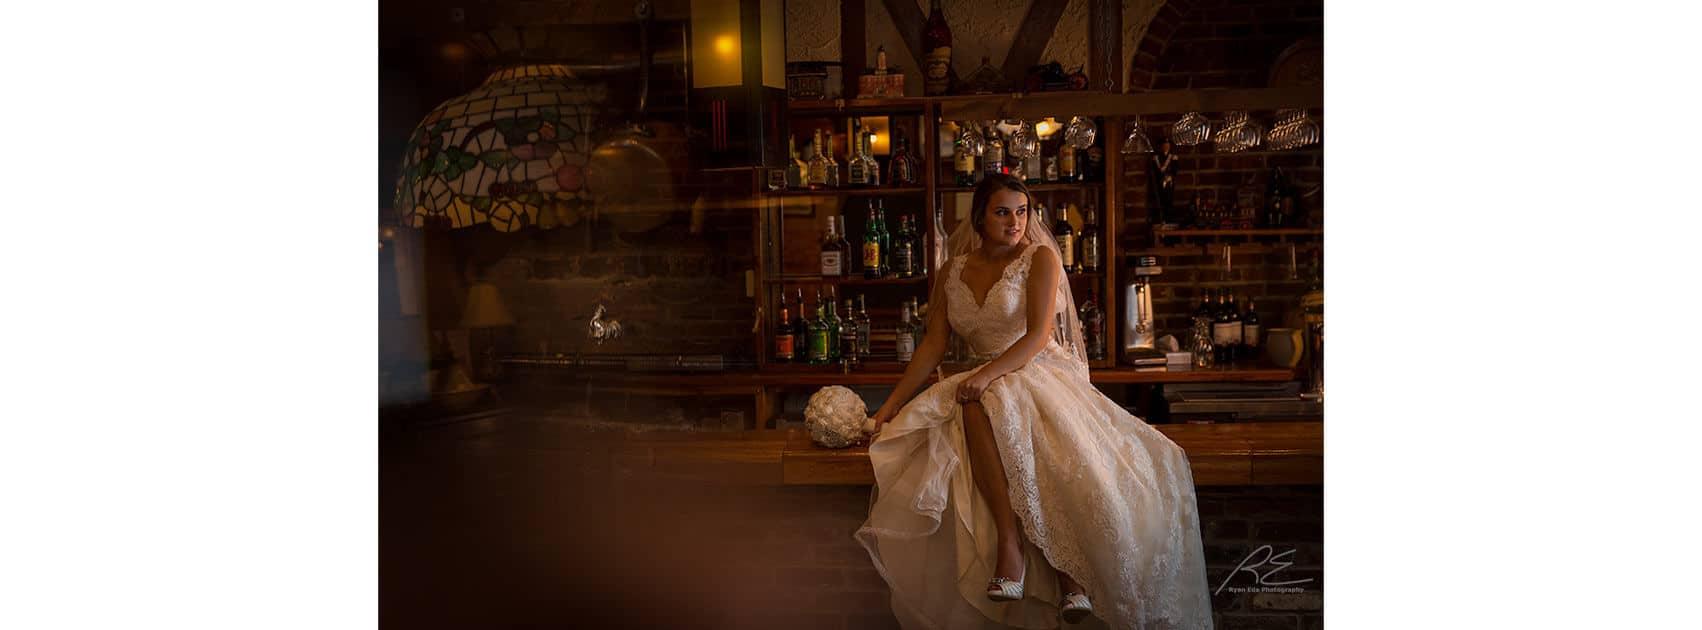 Towne House Weddings